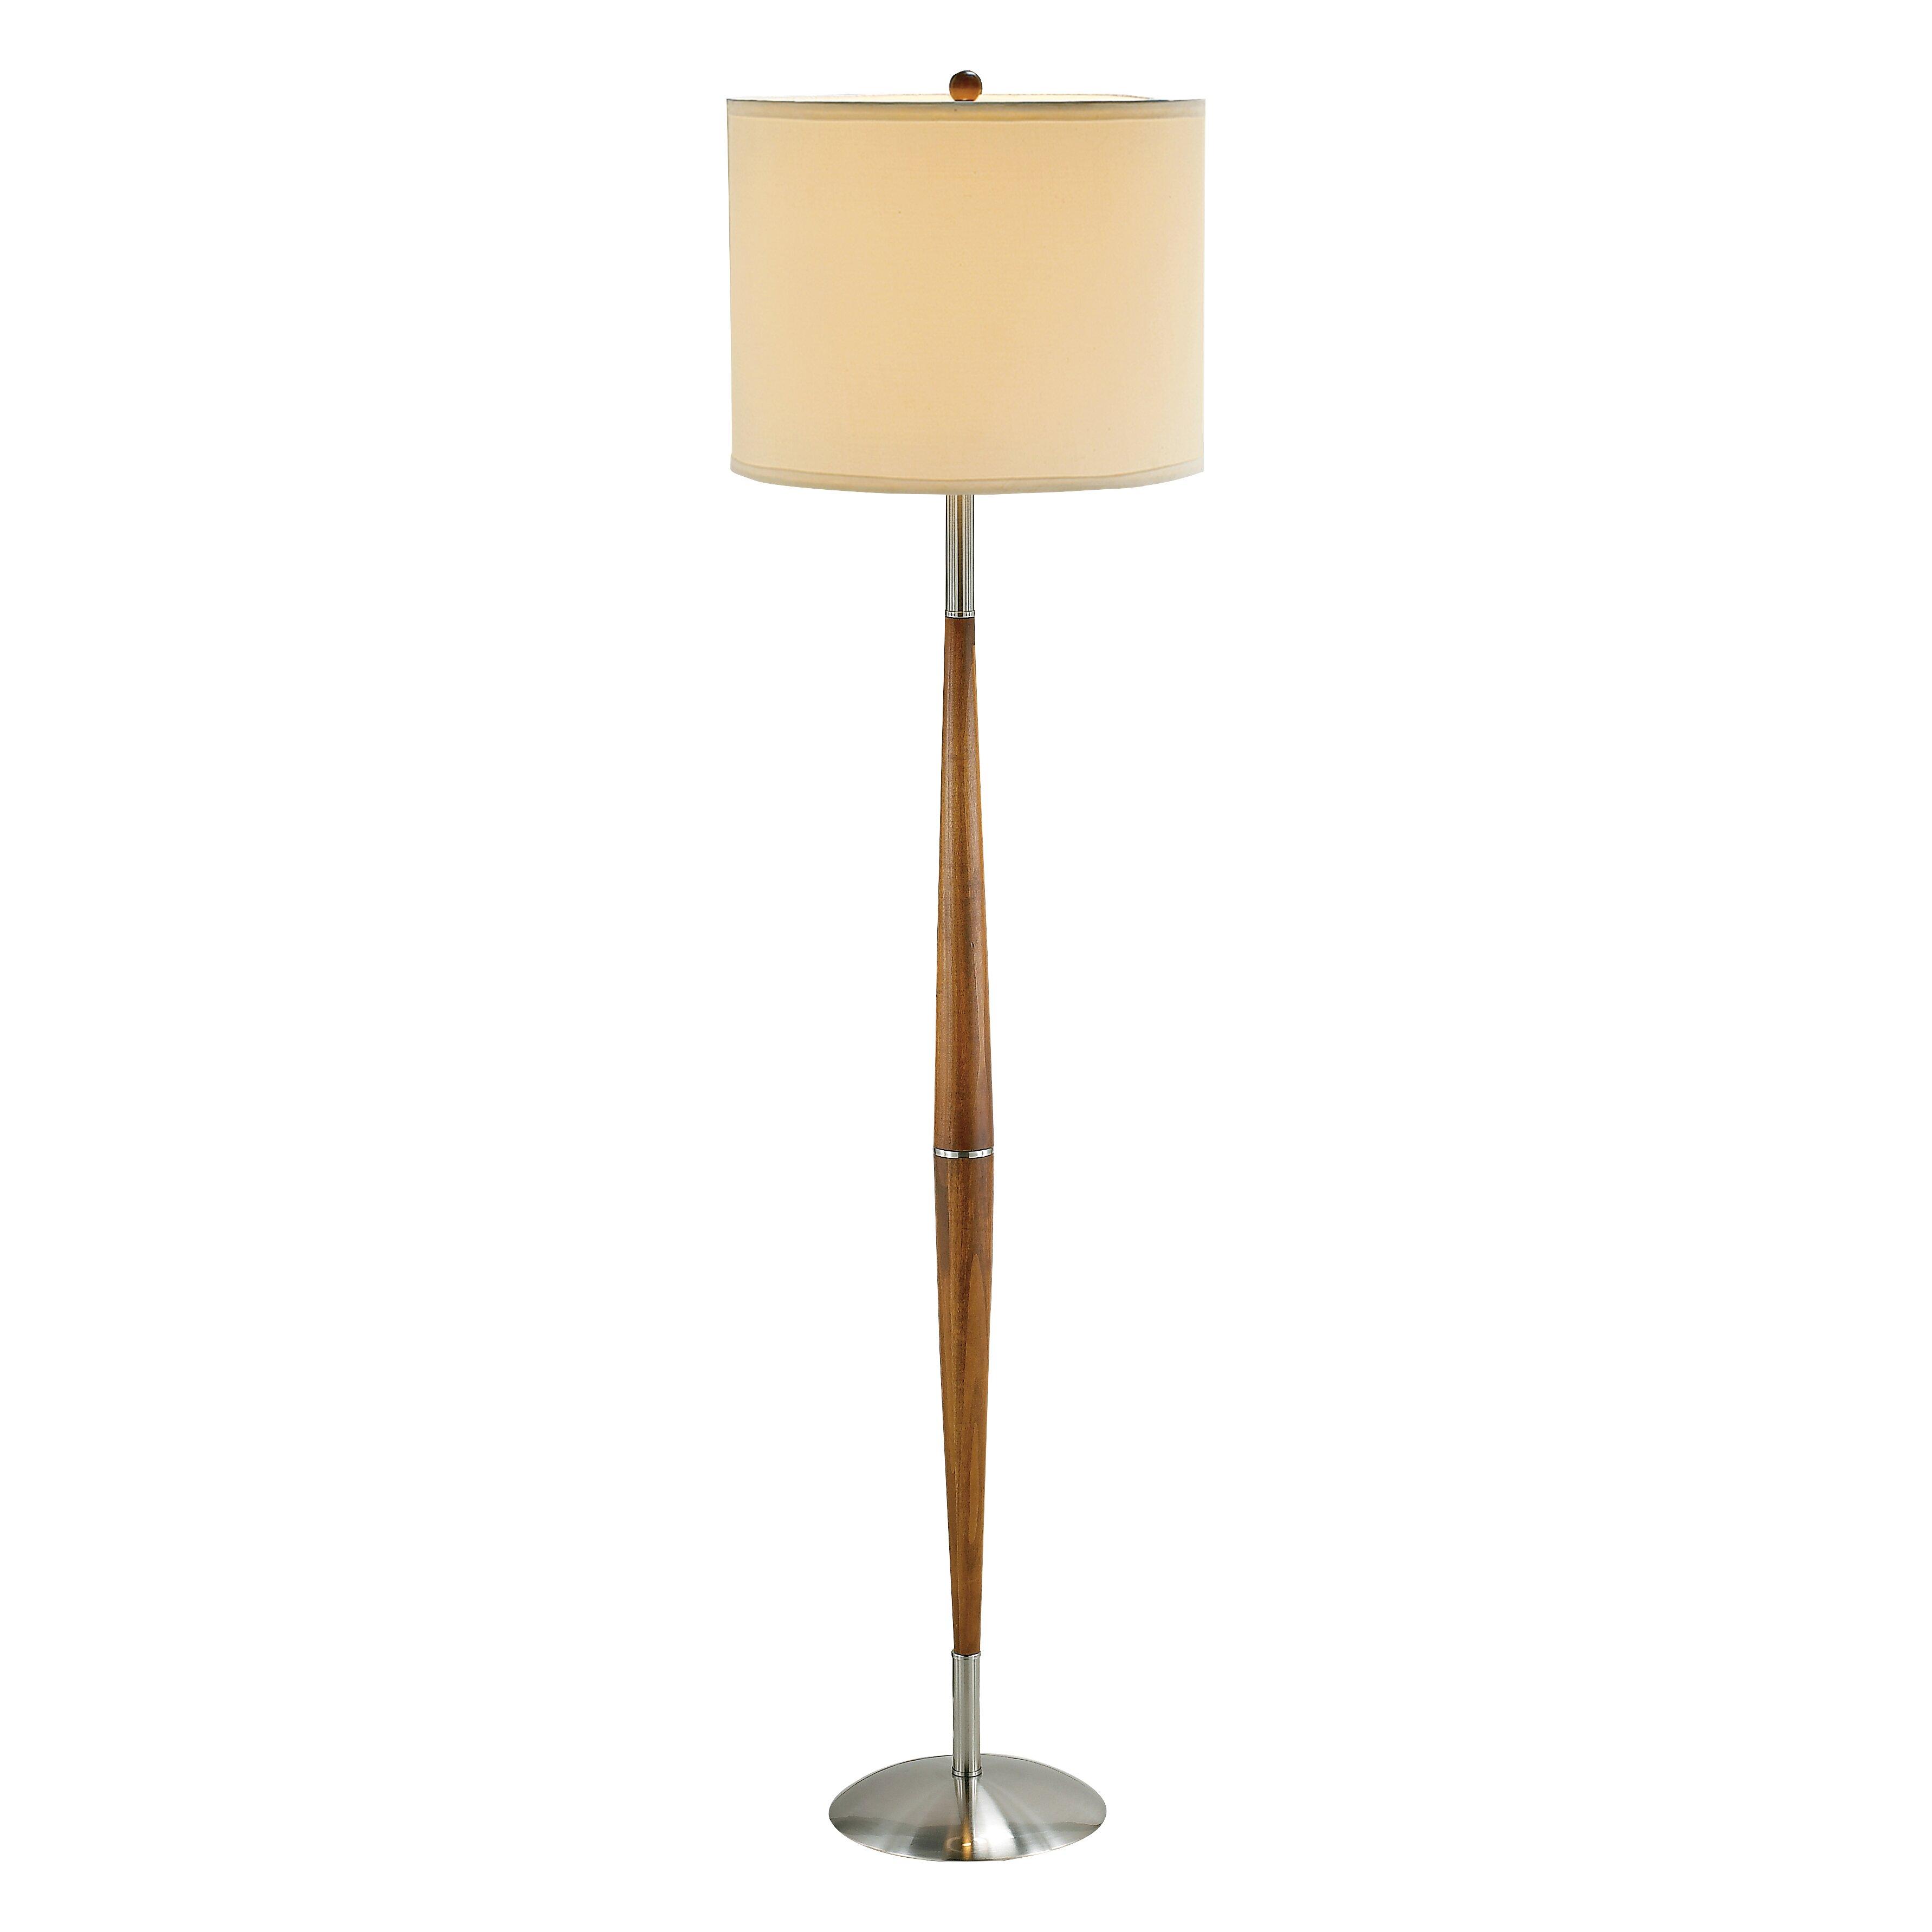 lighting lamps floor lamps mercury row sku mcrr2825. Black Bedroom Furniture Sets. Home Design Ideas